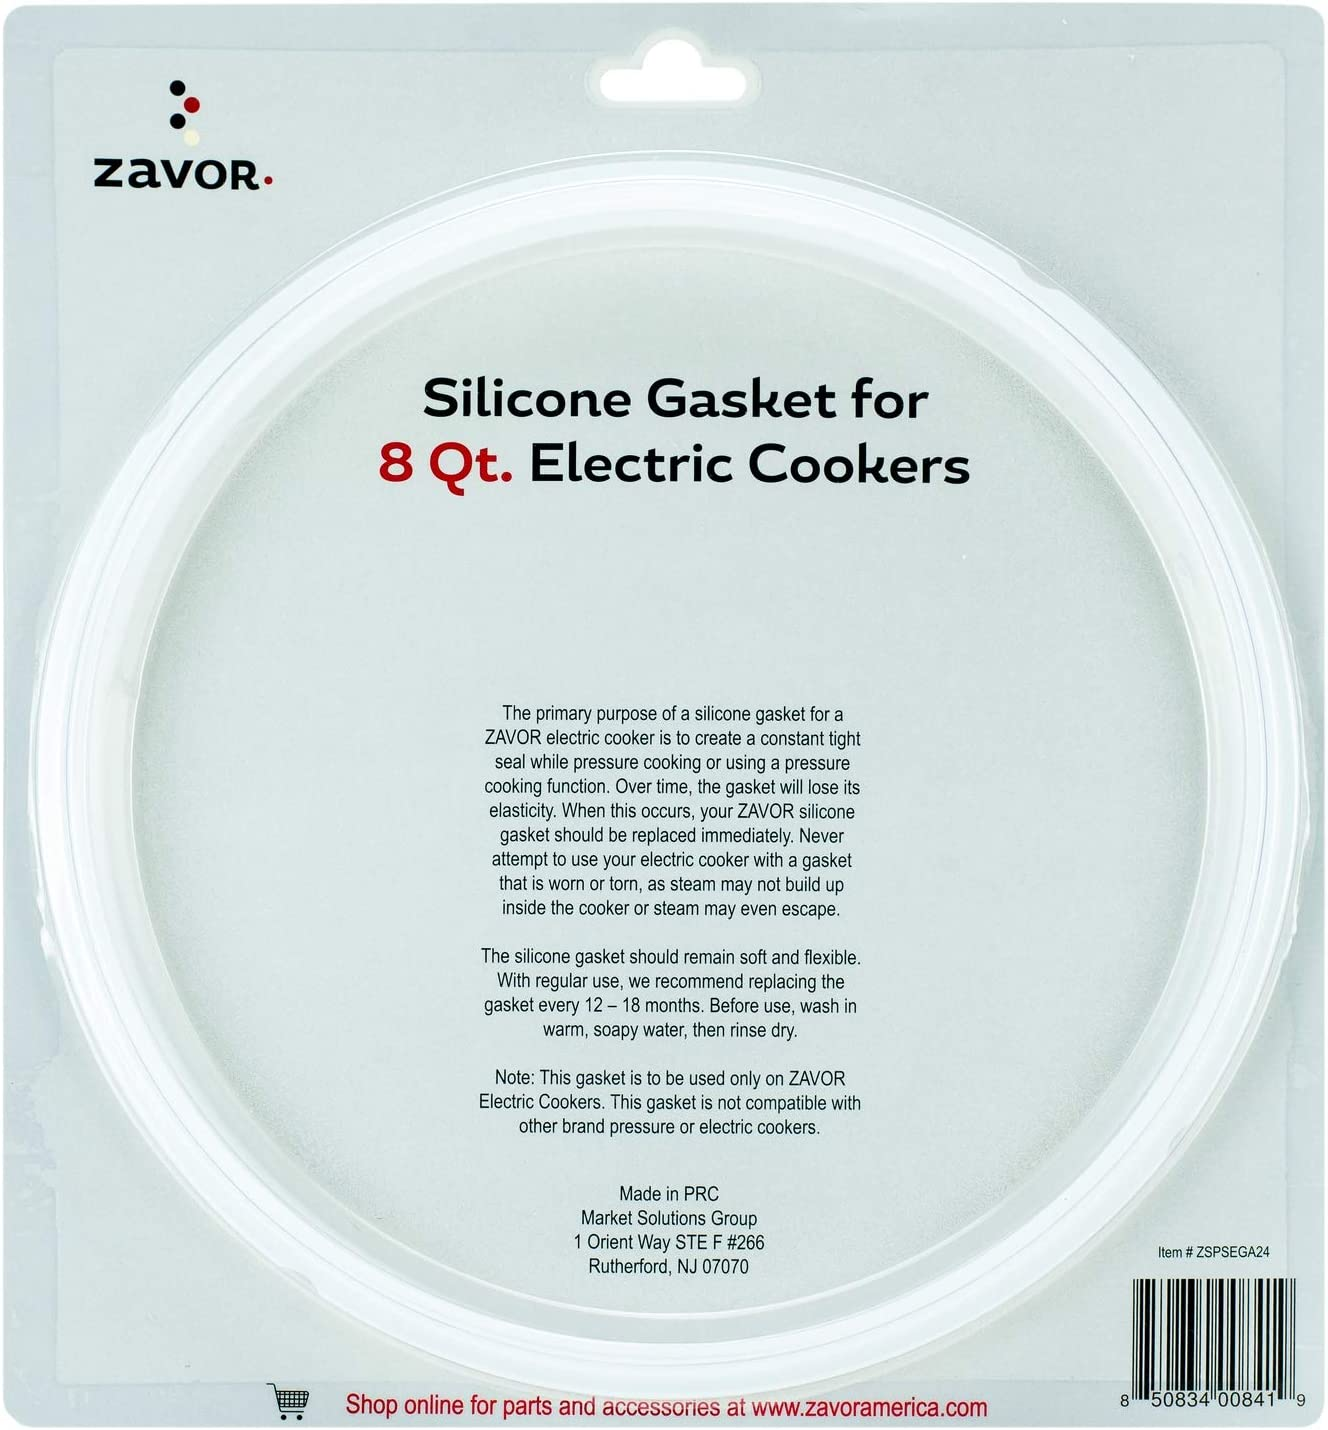 Zavor Silicone Gasket for Zavor 8 Quart Electric Cookers (ZSPSEGA24)